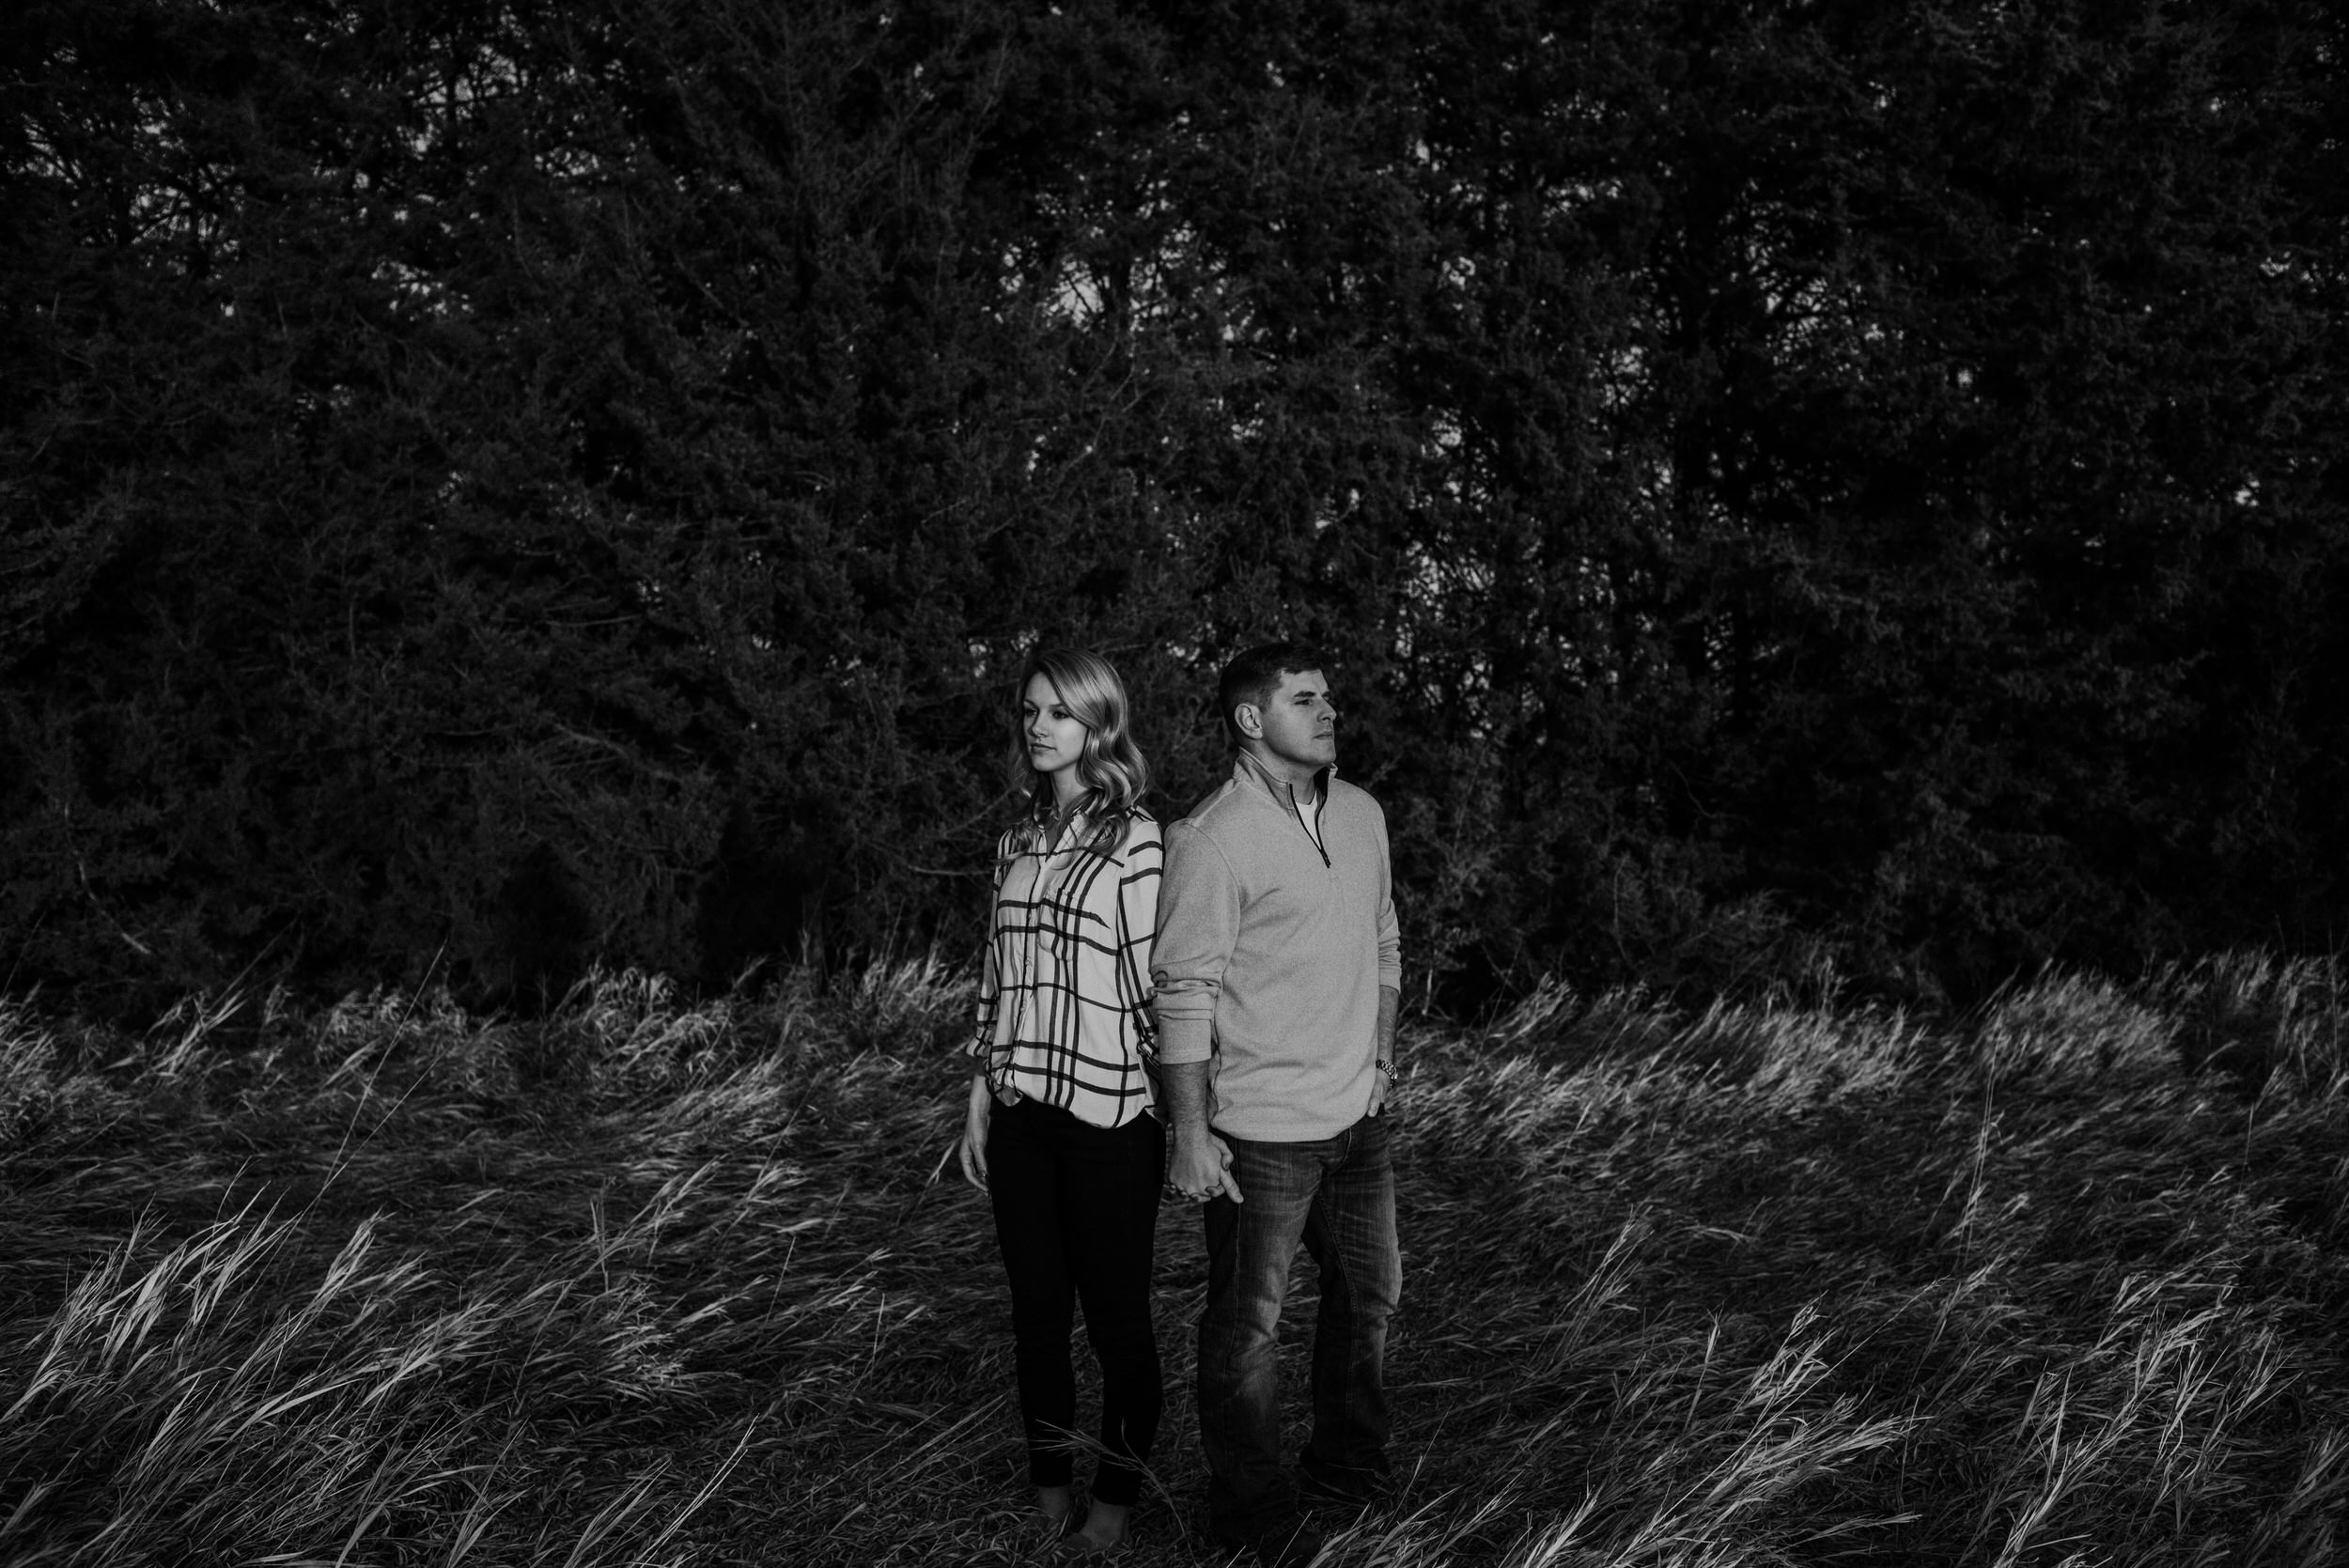 Nebraska Engagement Photographer Kaylie Sirek Photography 21.jpg